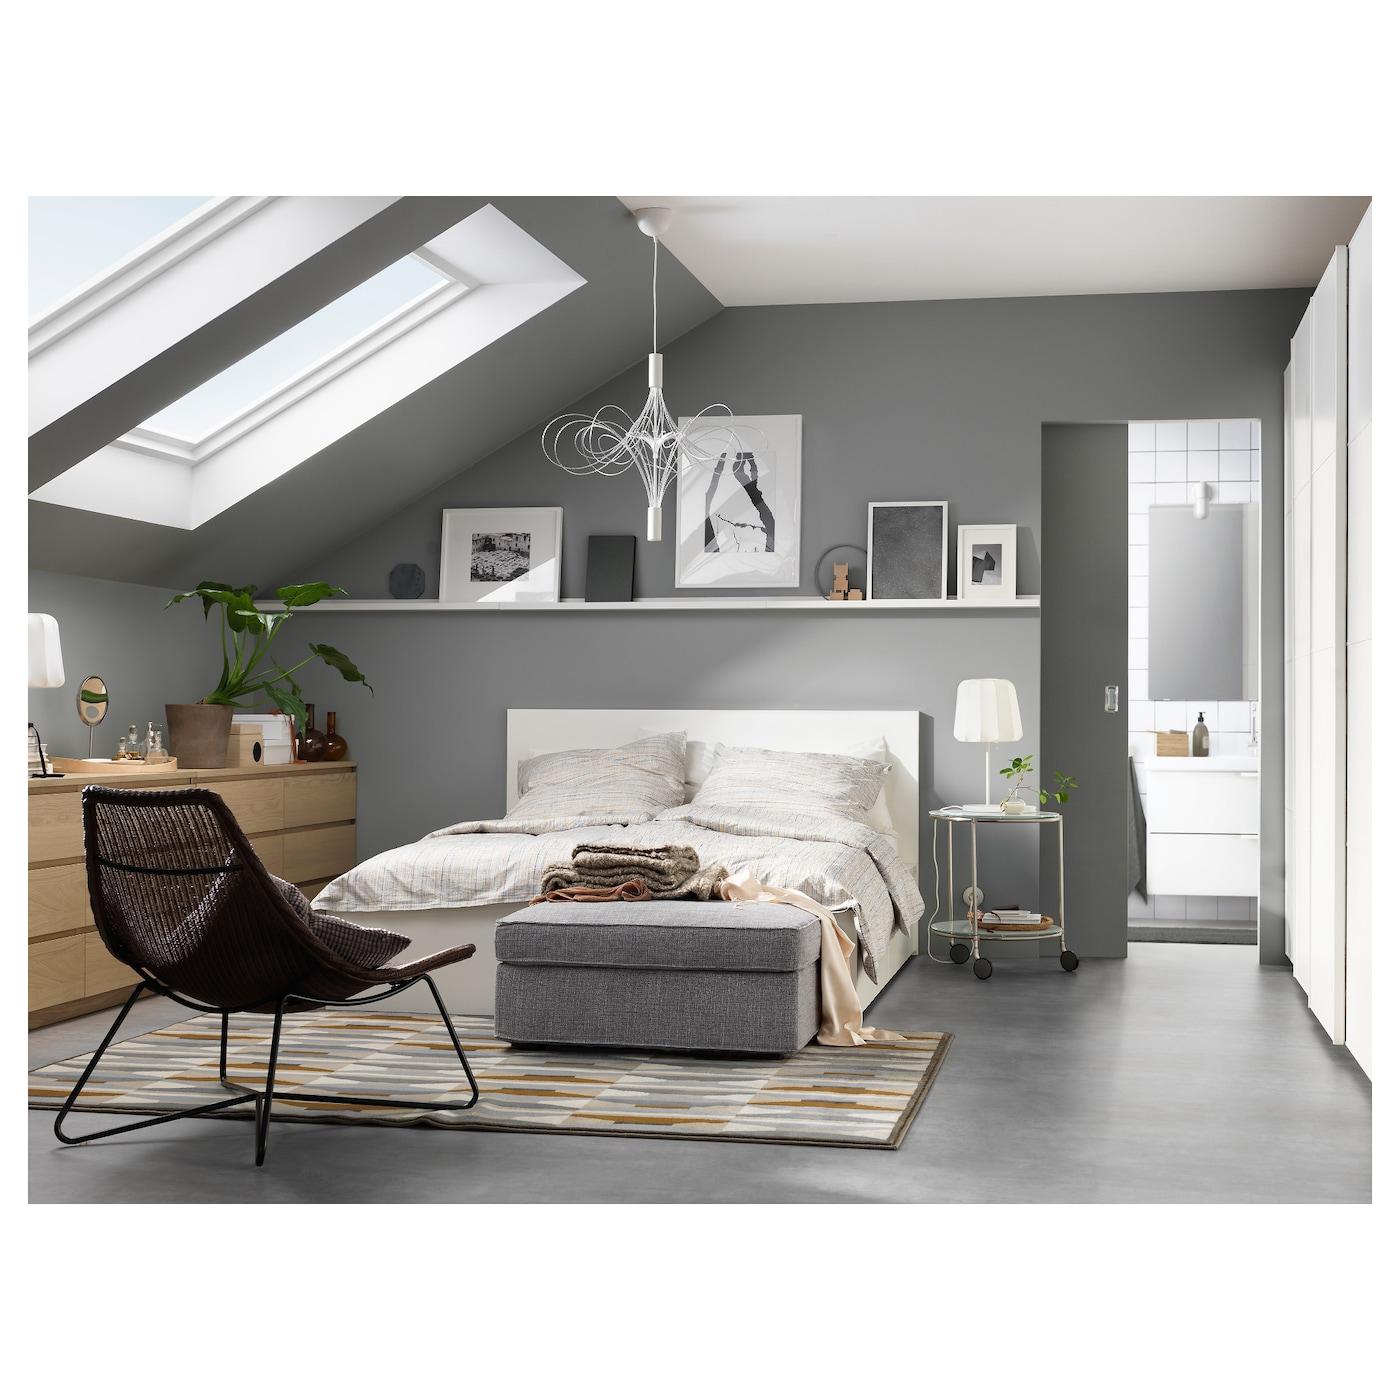 Etonnant MALM Bed Frame, High, W 2 Storage Boxes White/lönset